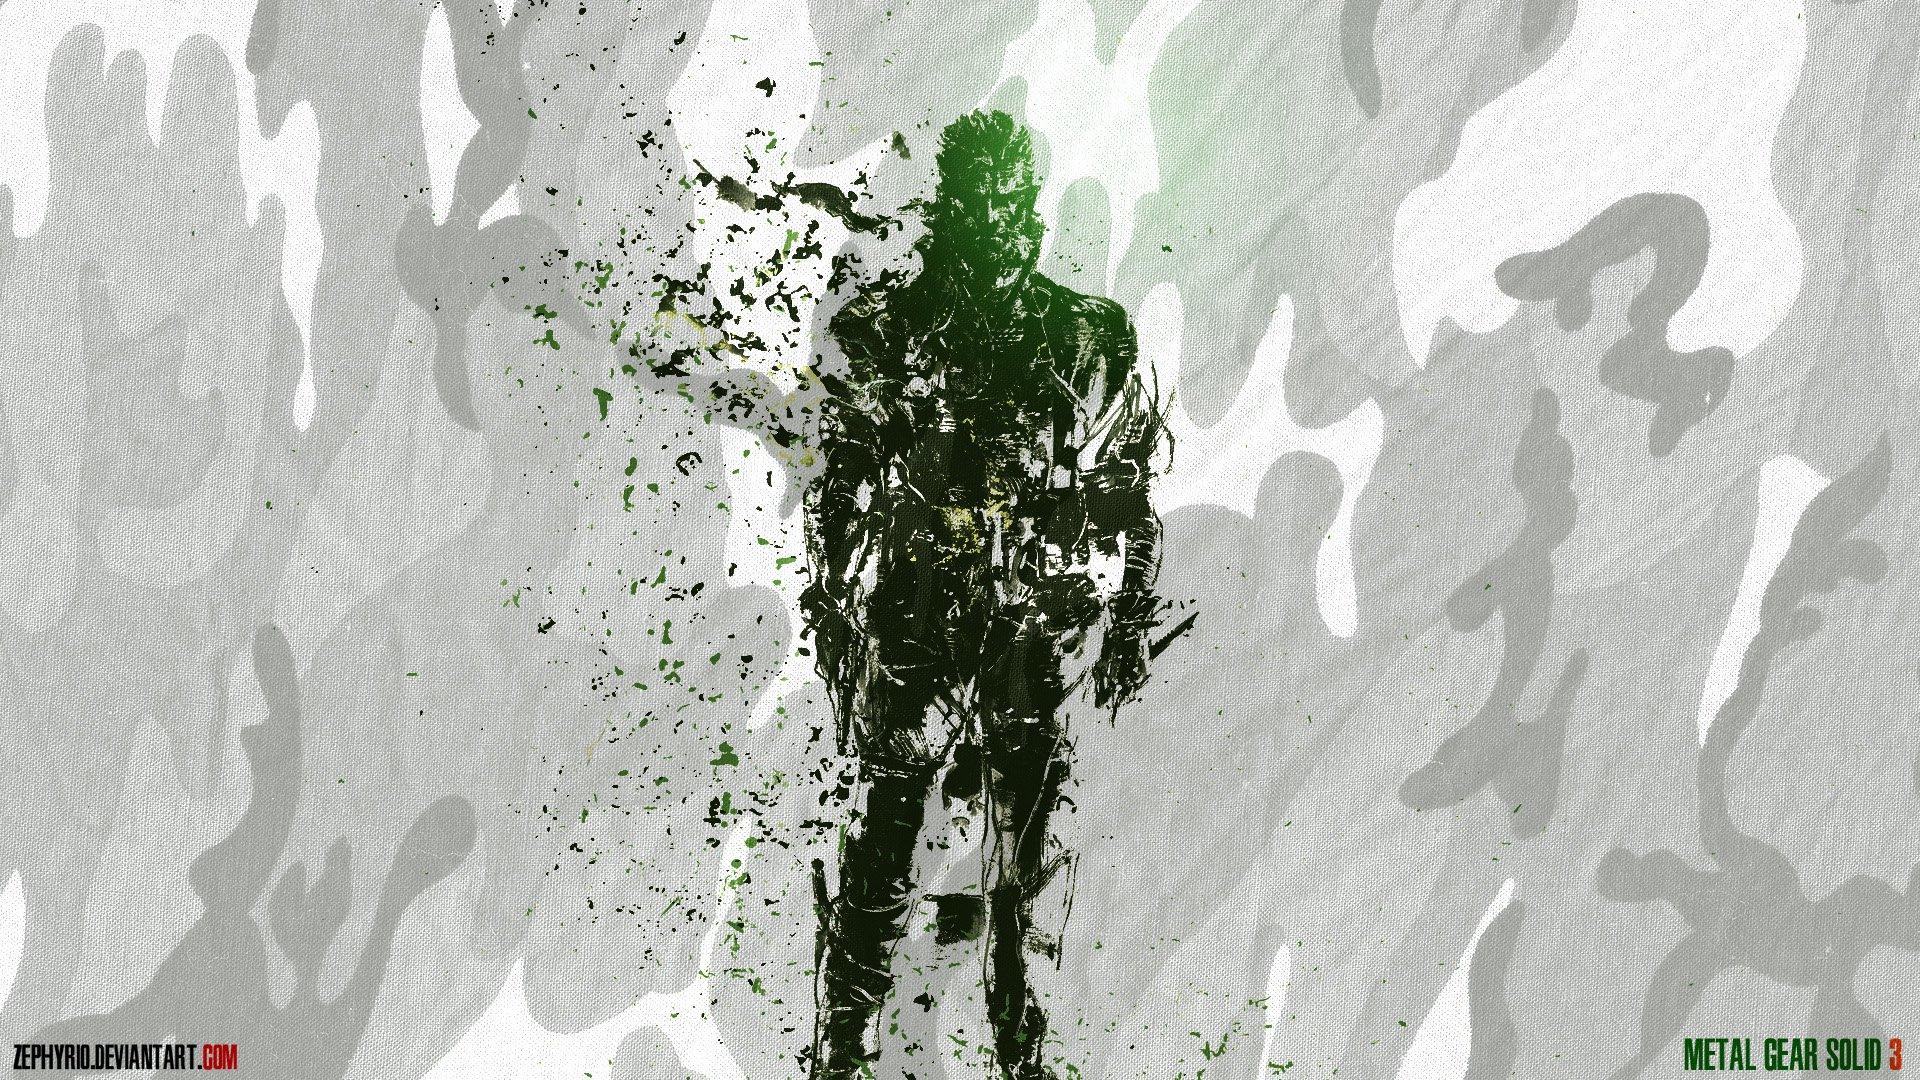 Fonds d'écran Jeux Vidéo Metal Gear Solid 3 Naked Snake